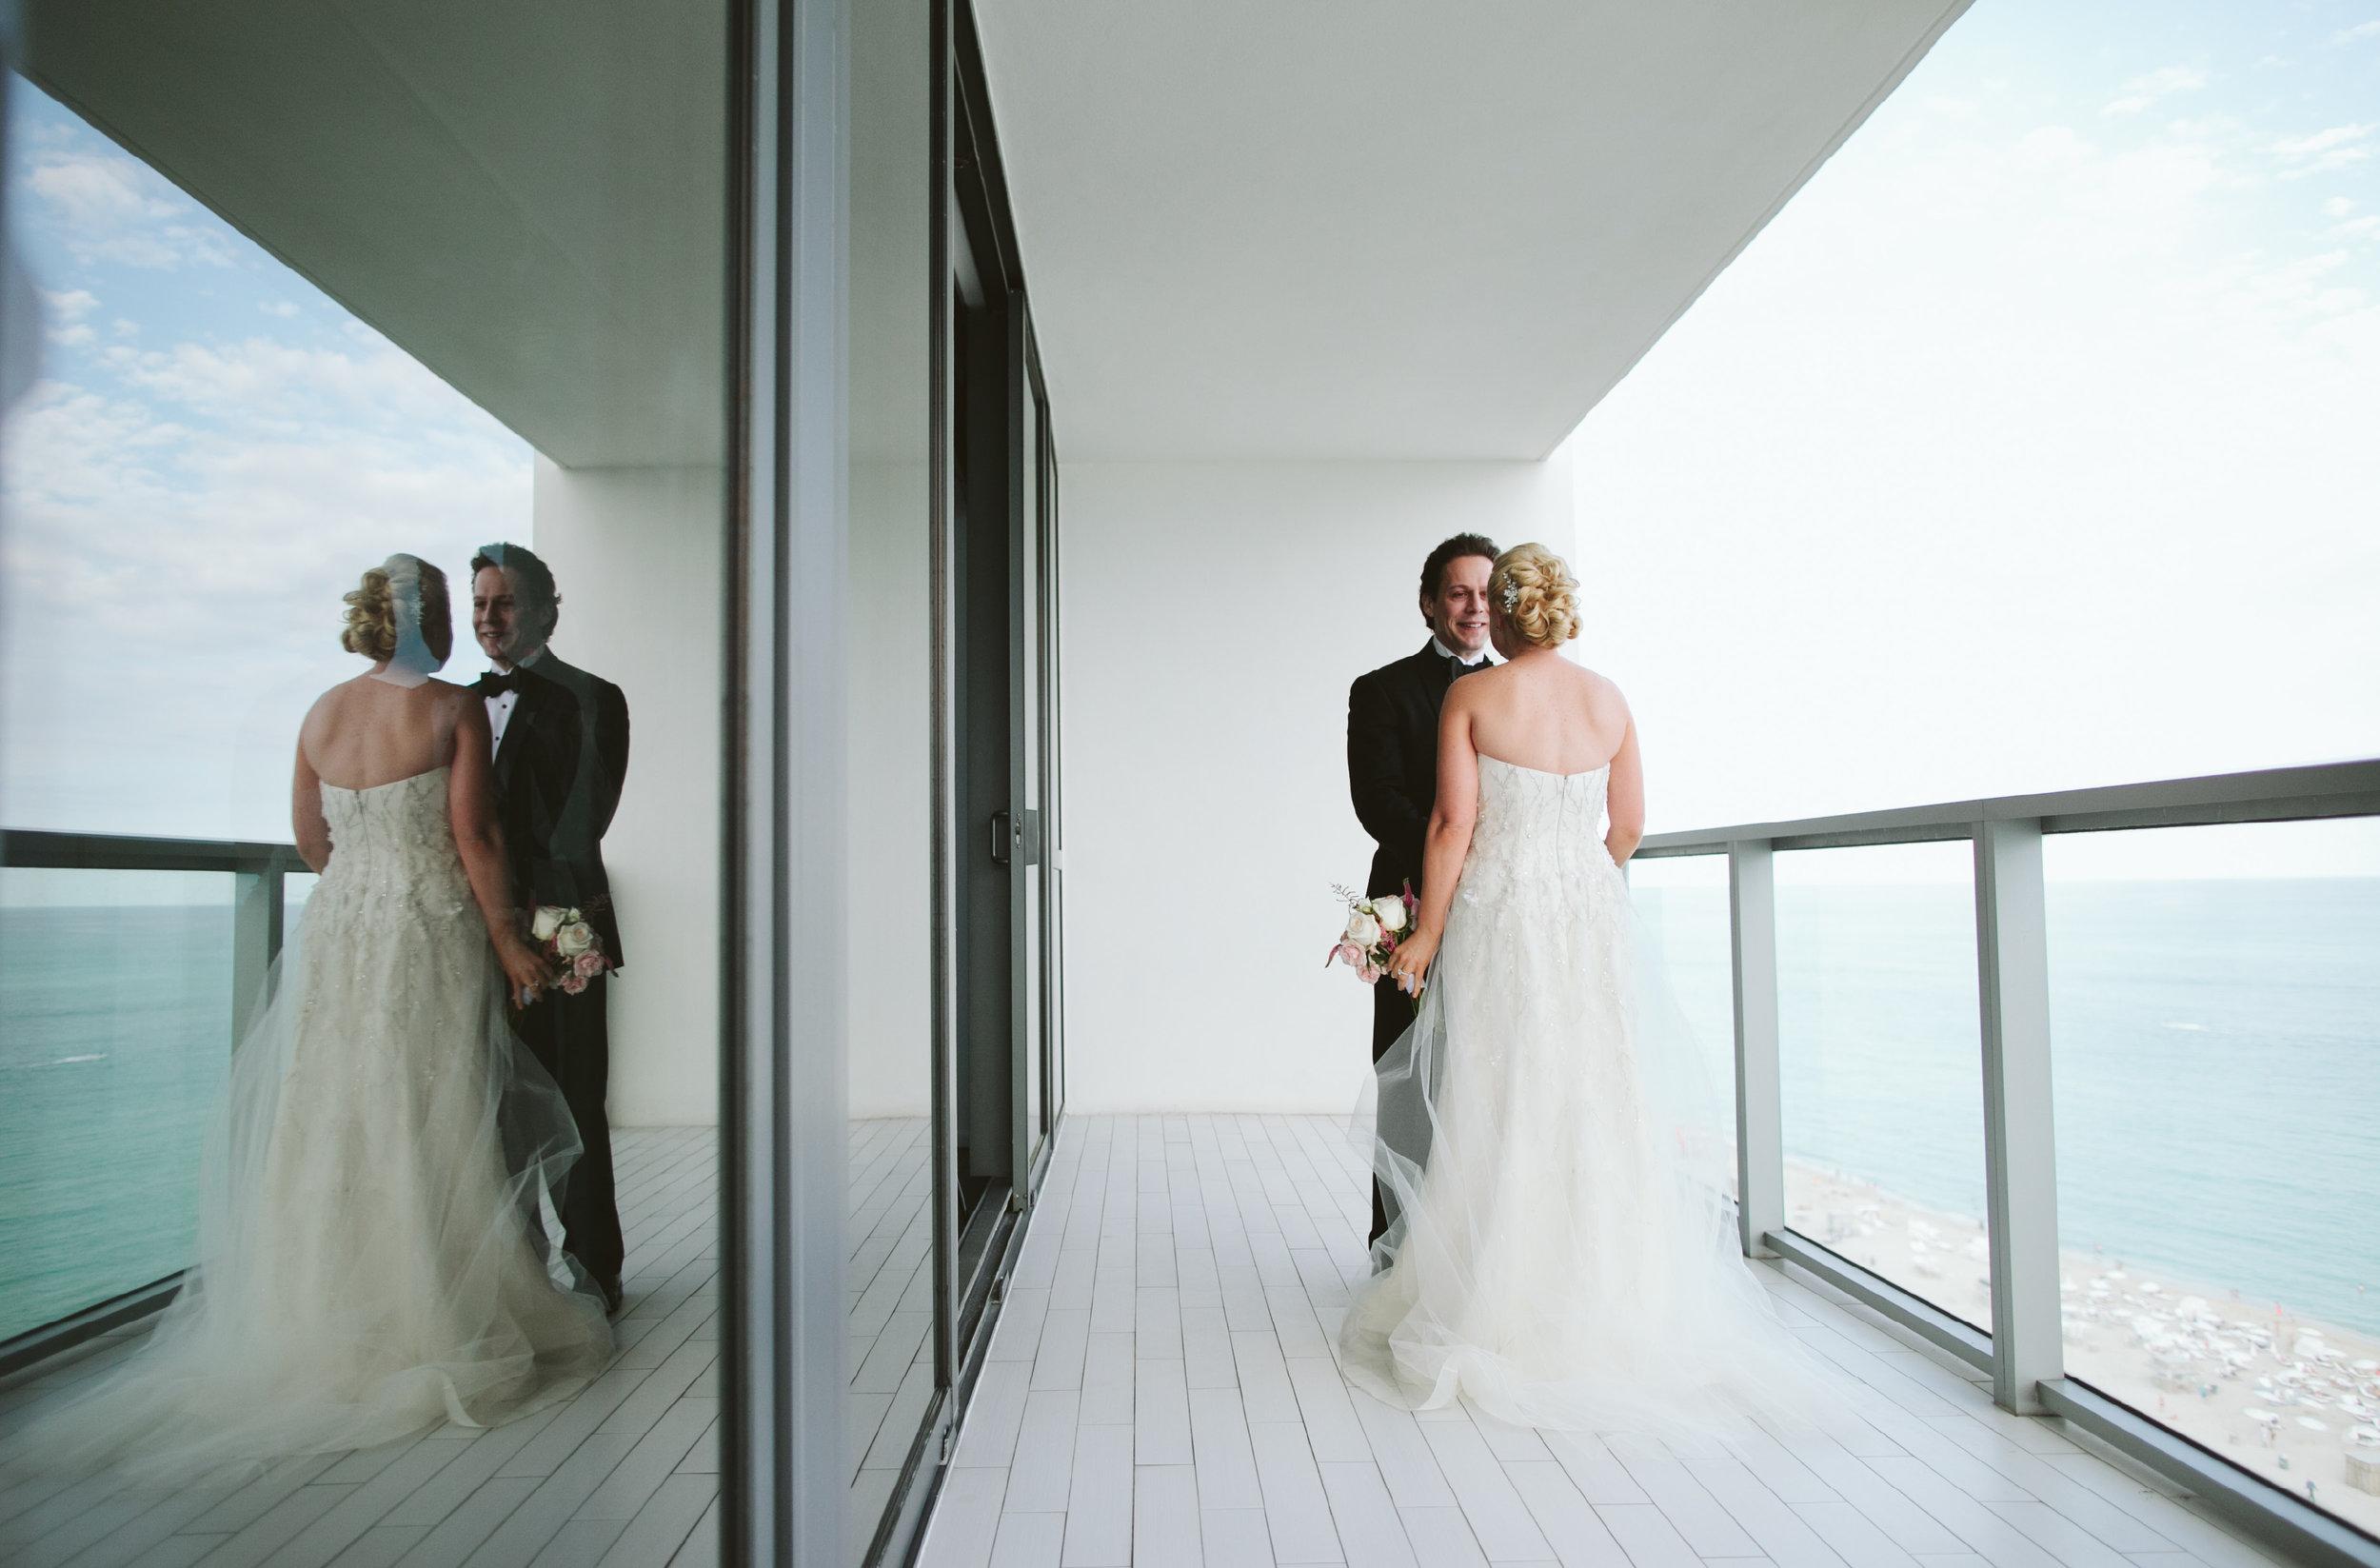 Jackie + Joe Wedding at the W South Beach Miami35.jpg